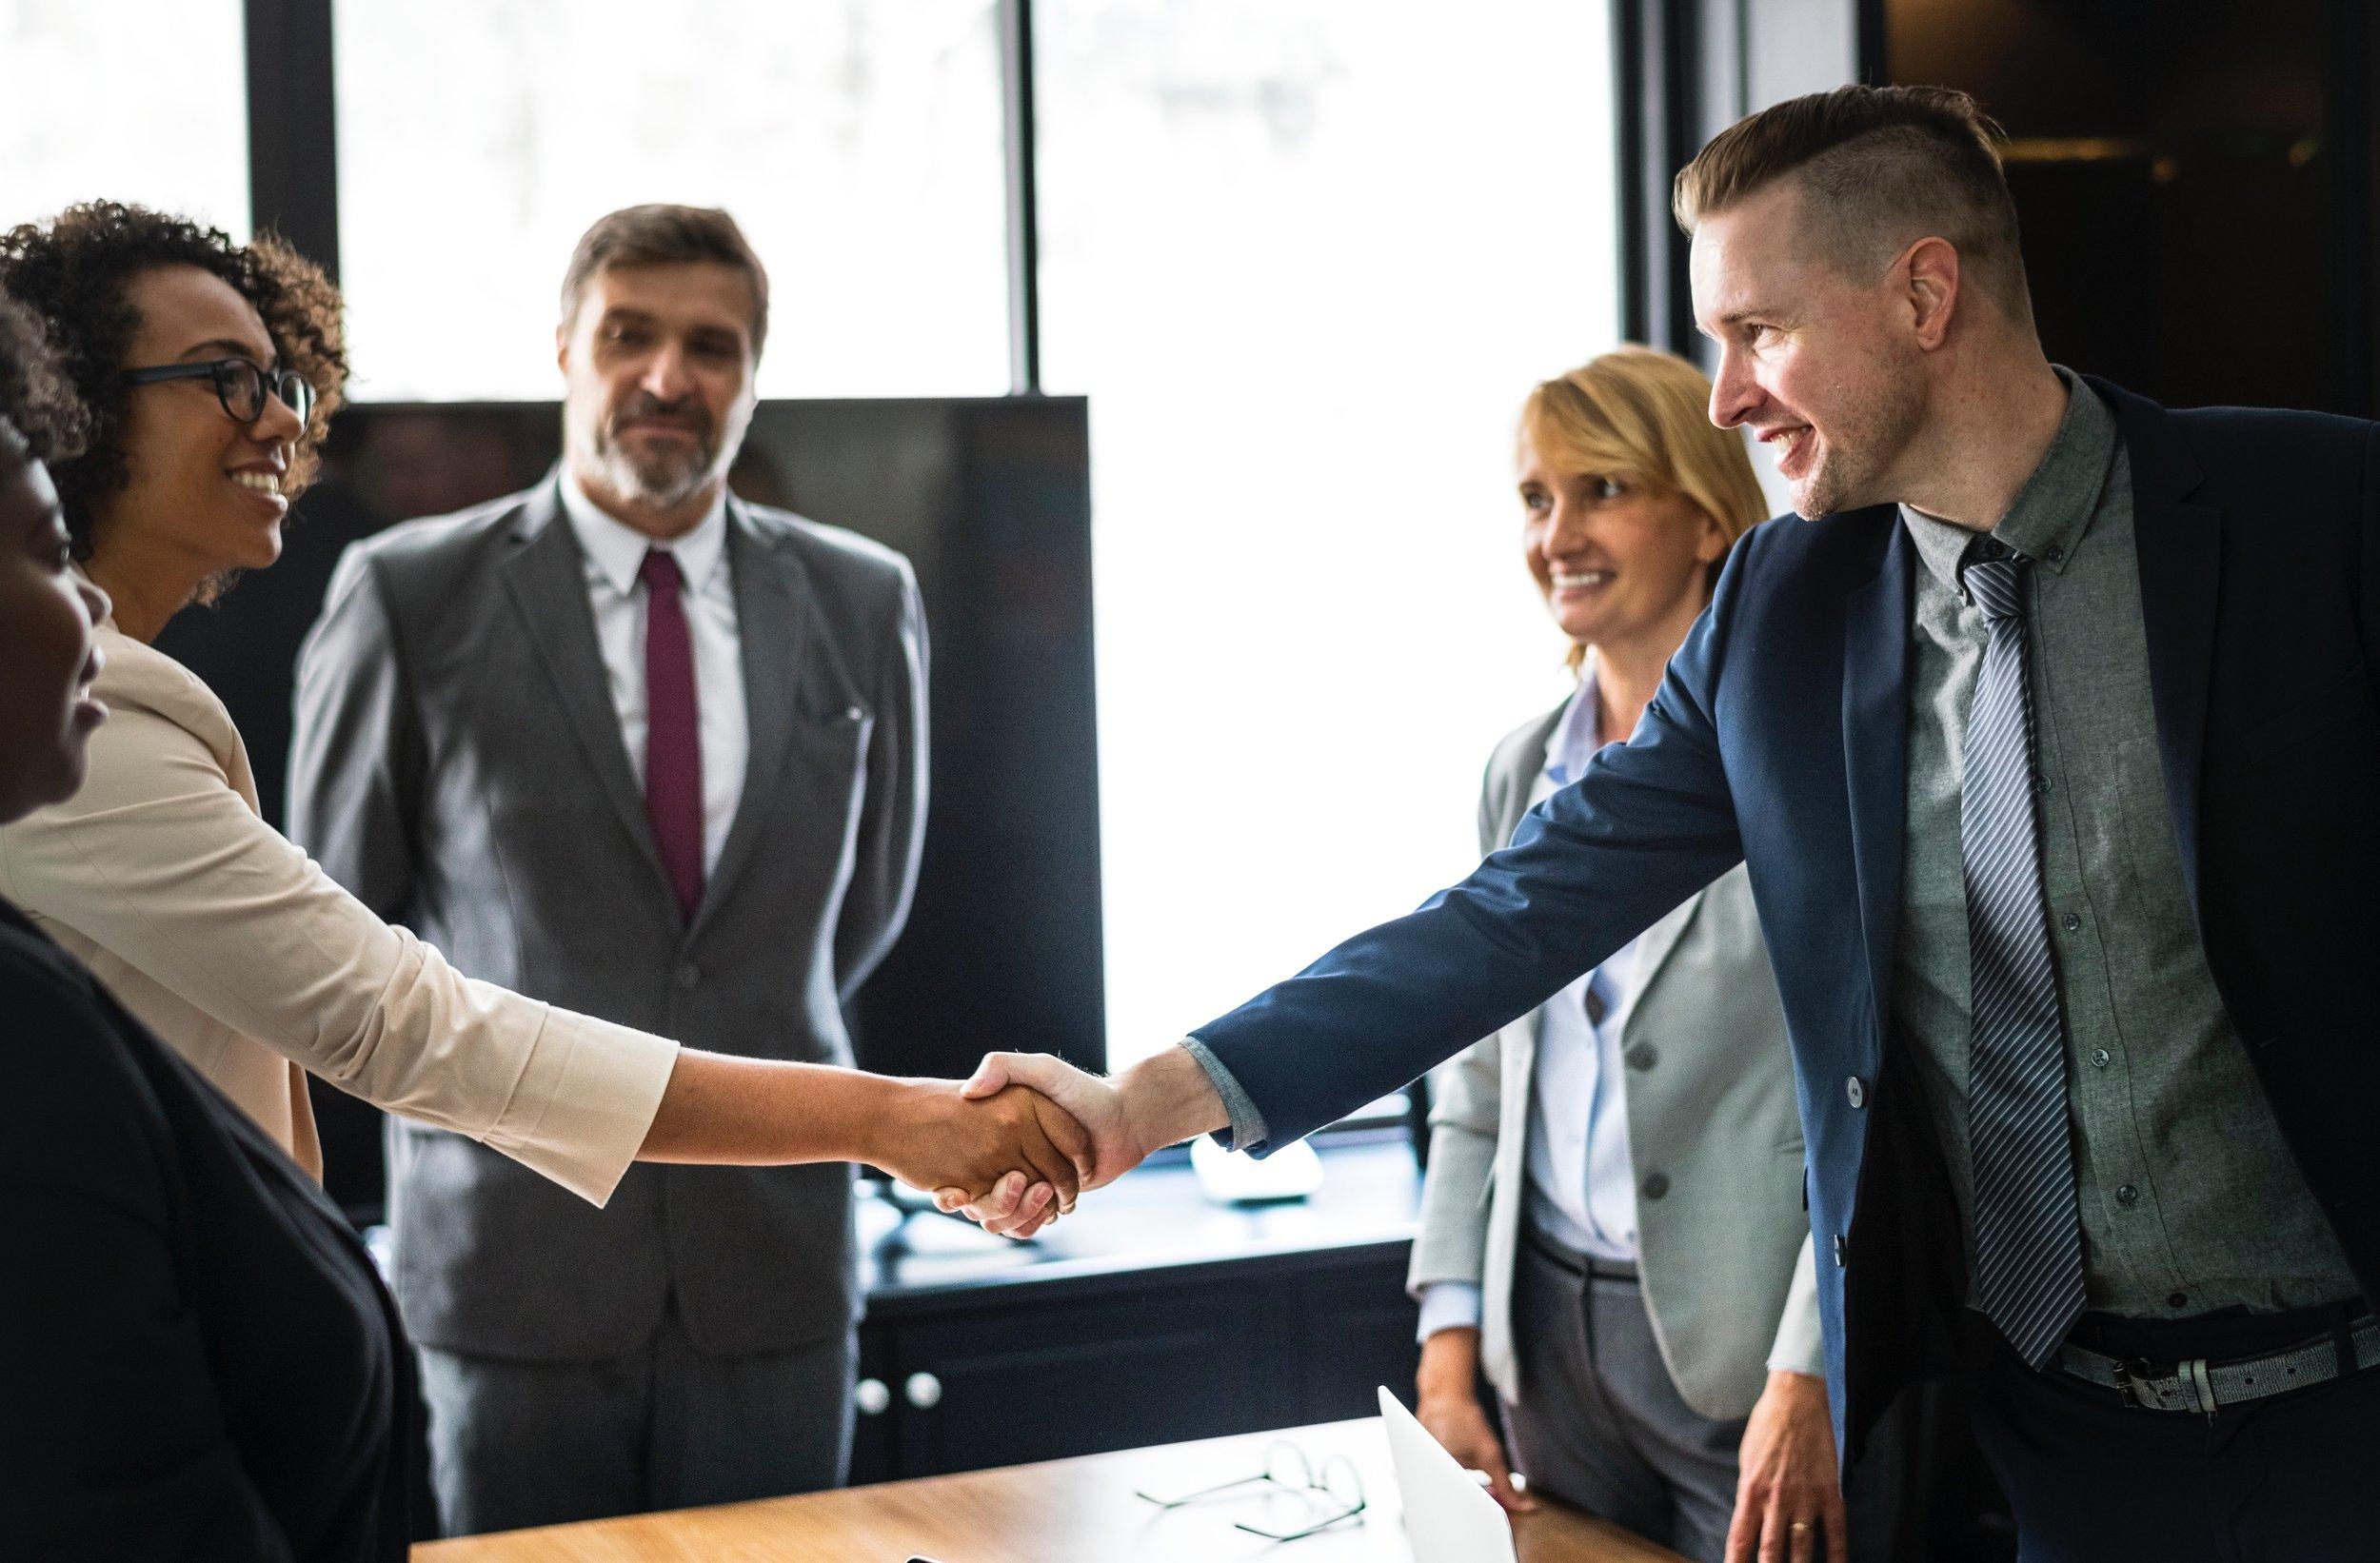 keys-of-leadership-planning-minneapolis-business.jpg